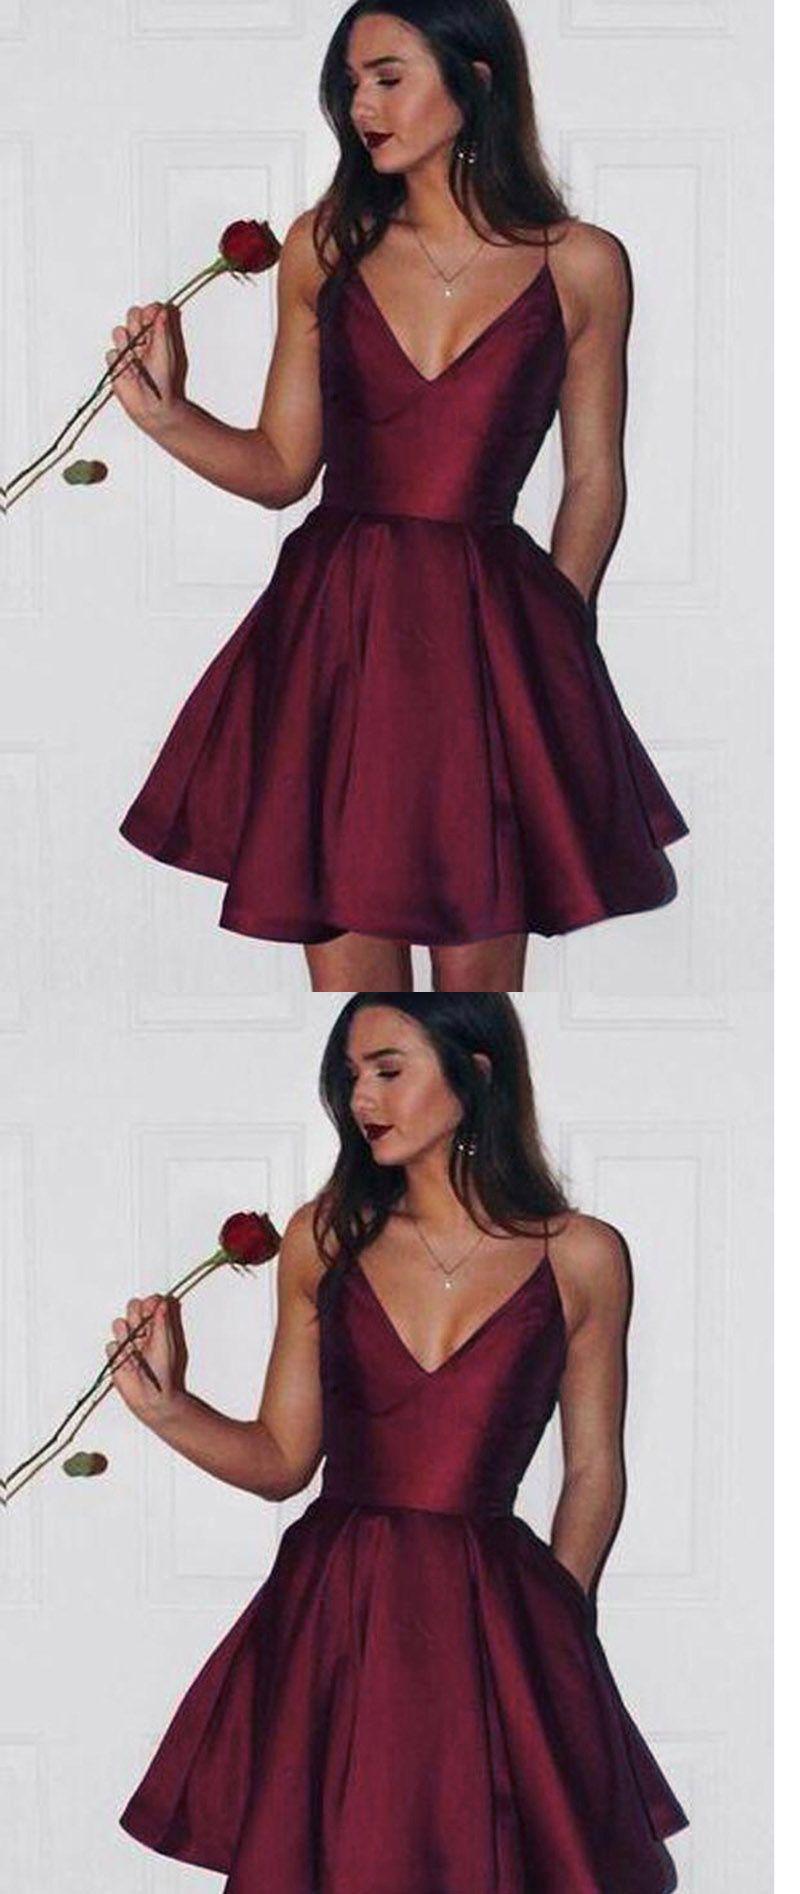 Pin on homecoming dress